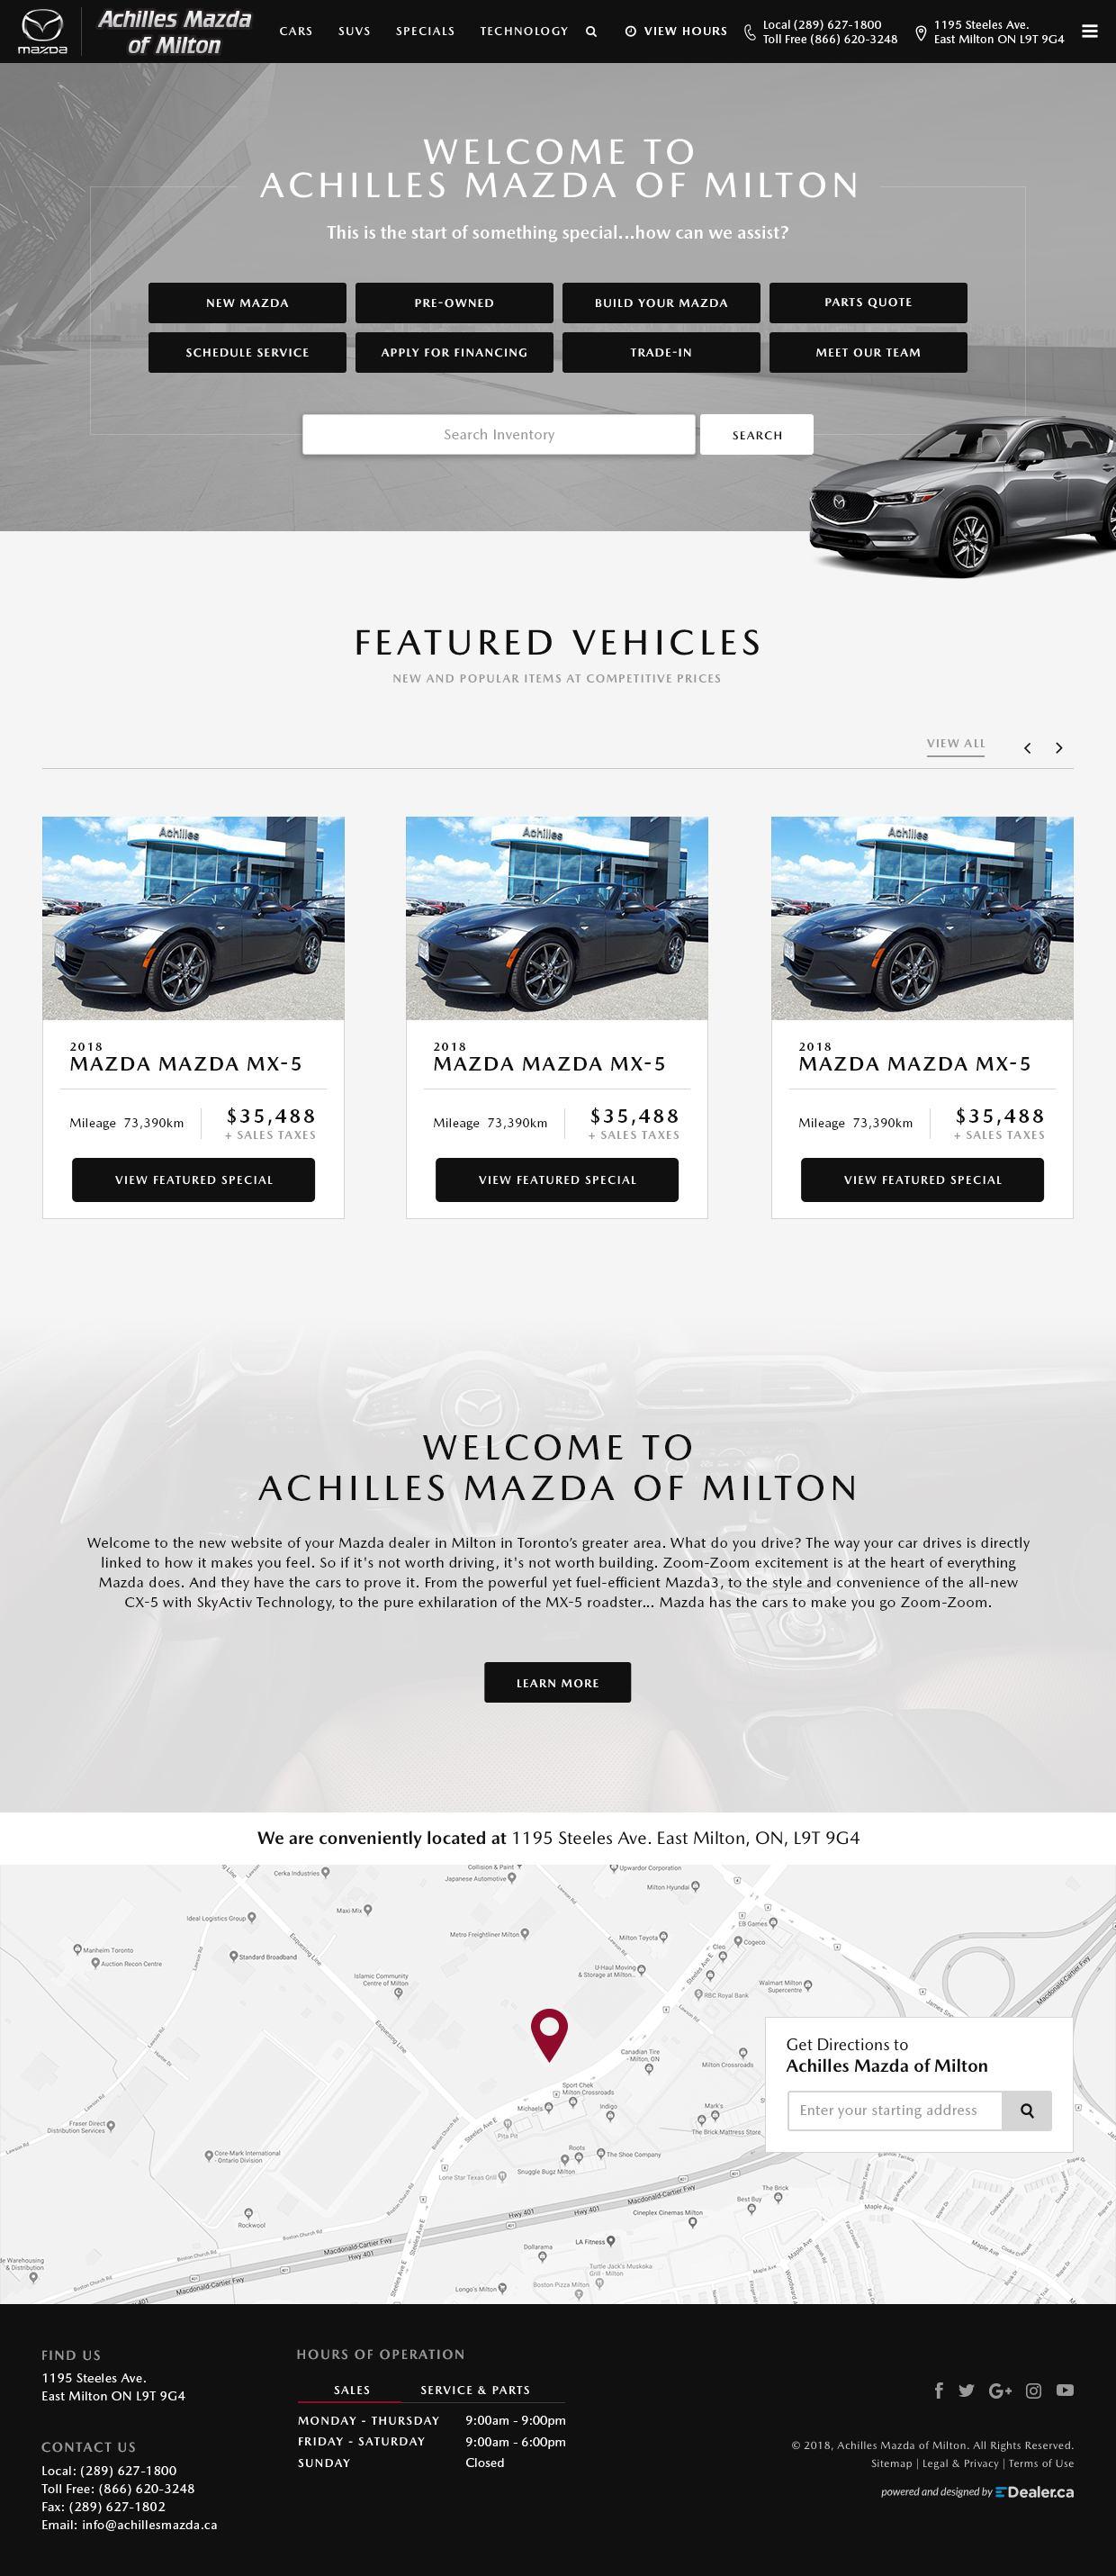 Achillies Mazda